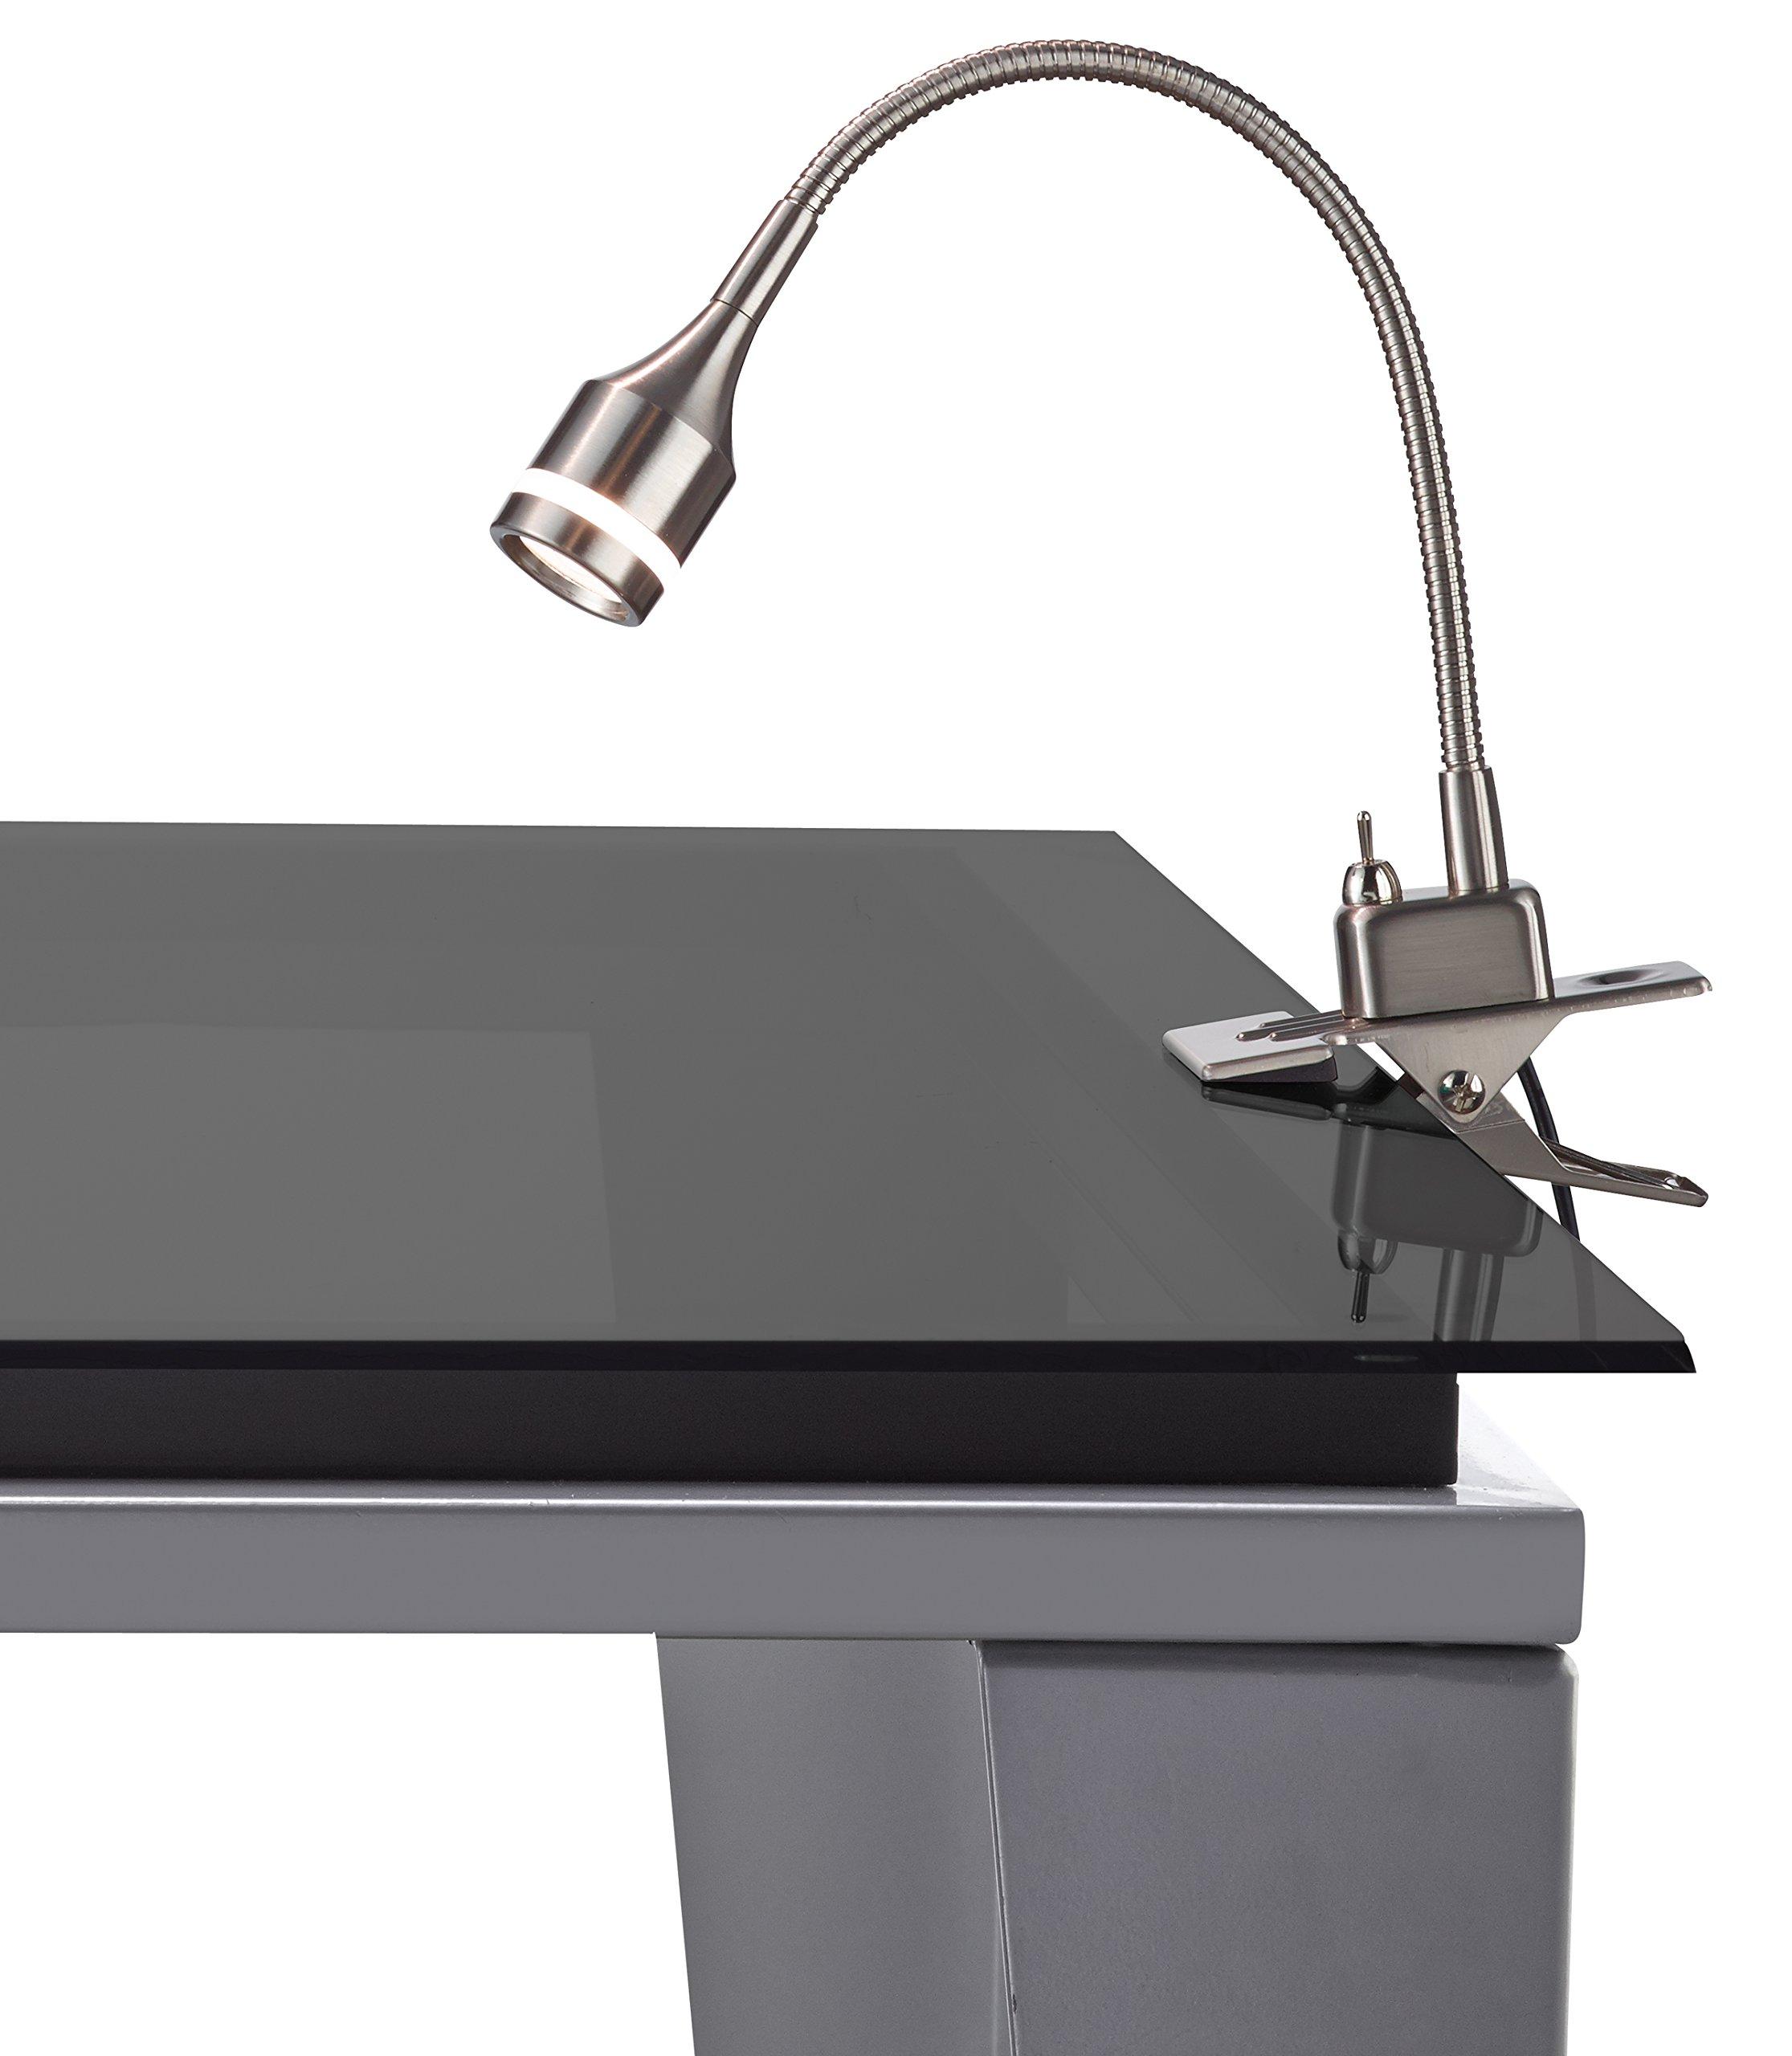 Adesso 3217-22 Prospect LED Clip Lamp, Steel, Smart Outlet Compatible, 9.5'' -14.5''